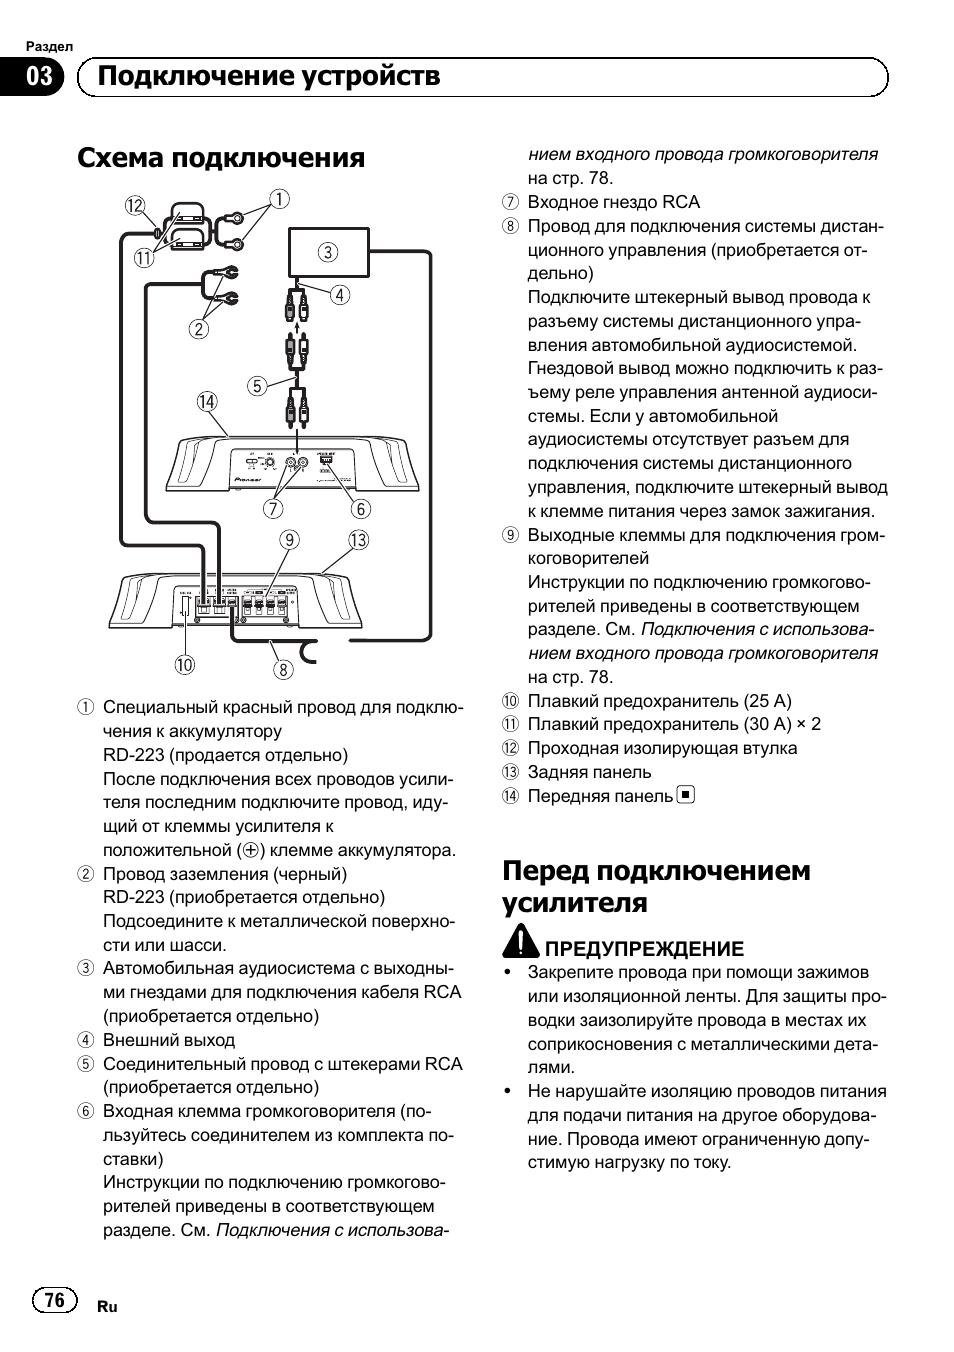 pioneer gm-3500t схема подключения